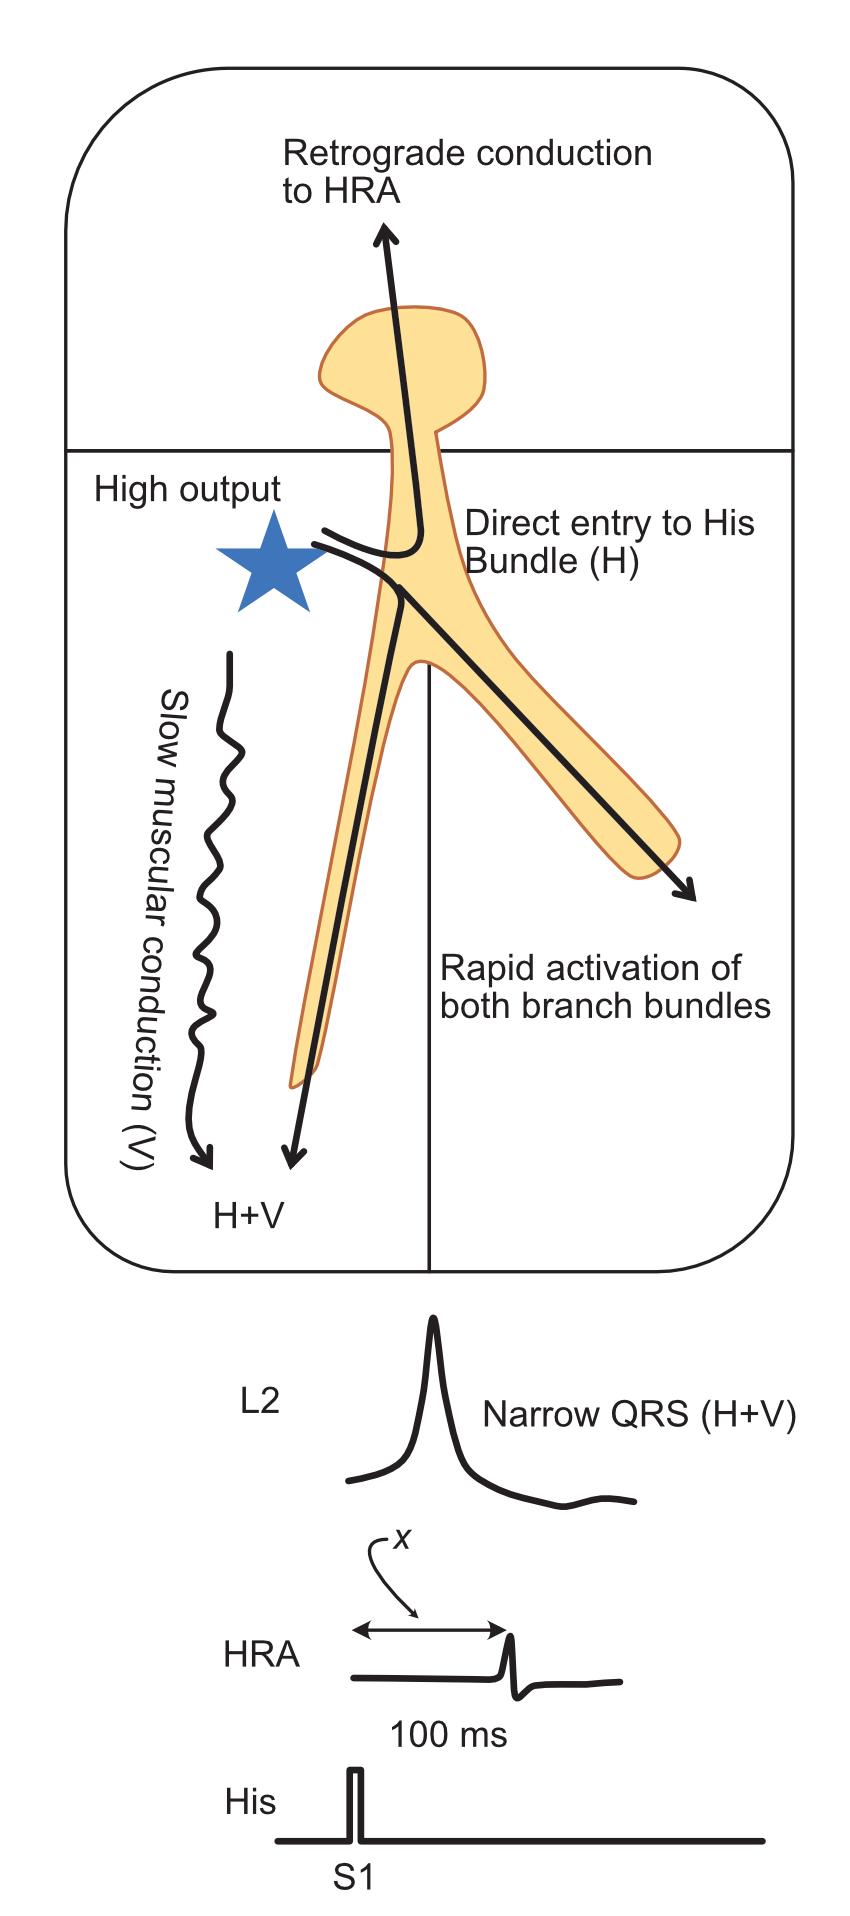 Parahisian pacing - capture of His bundle and myocardium at high output